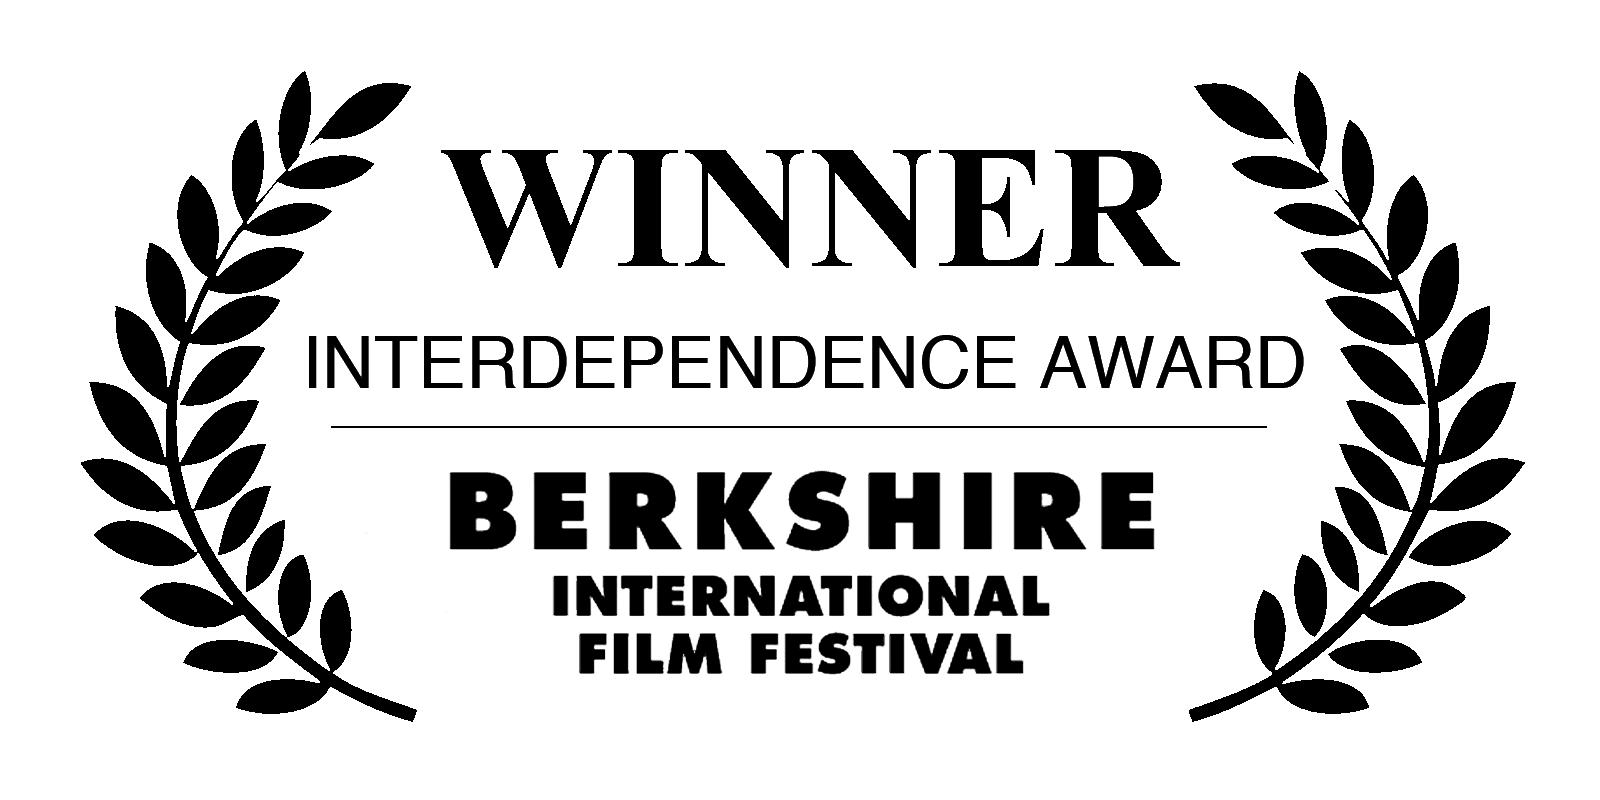 BERKSHIRE-INTERDEPENDENCE-AWARD-black.png